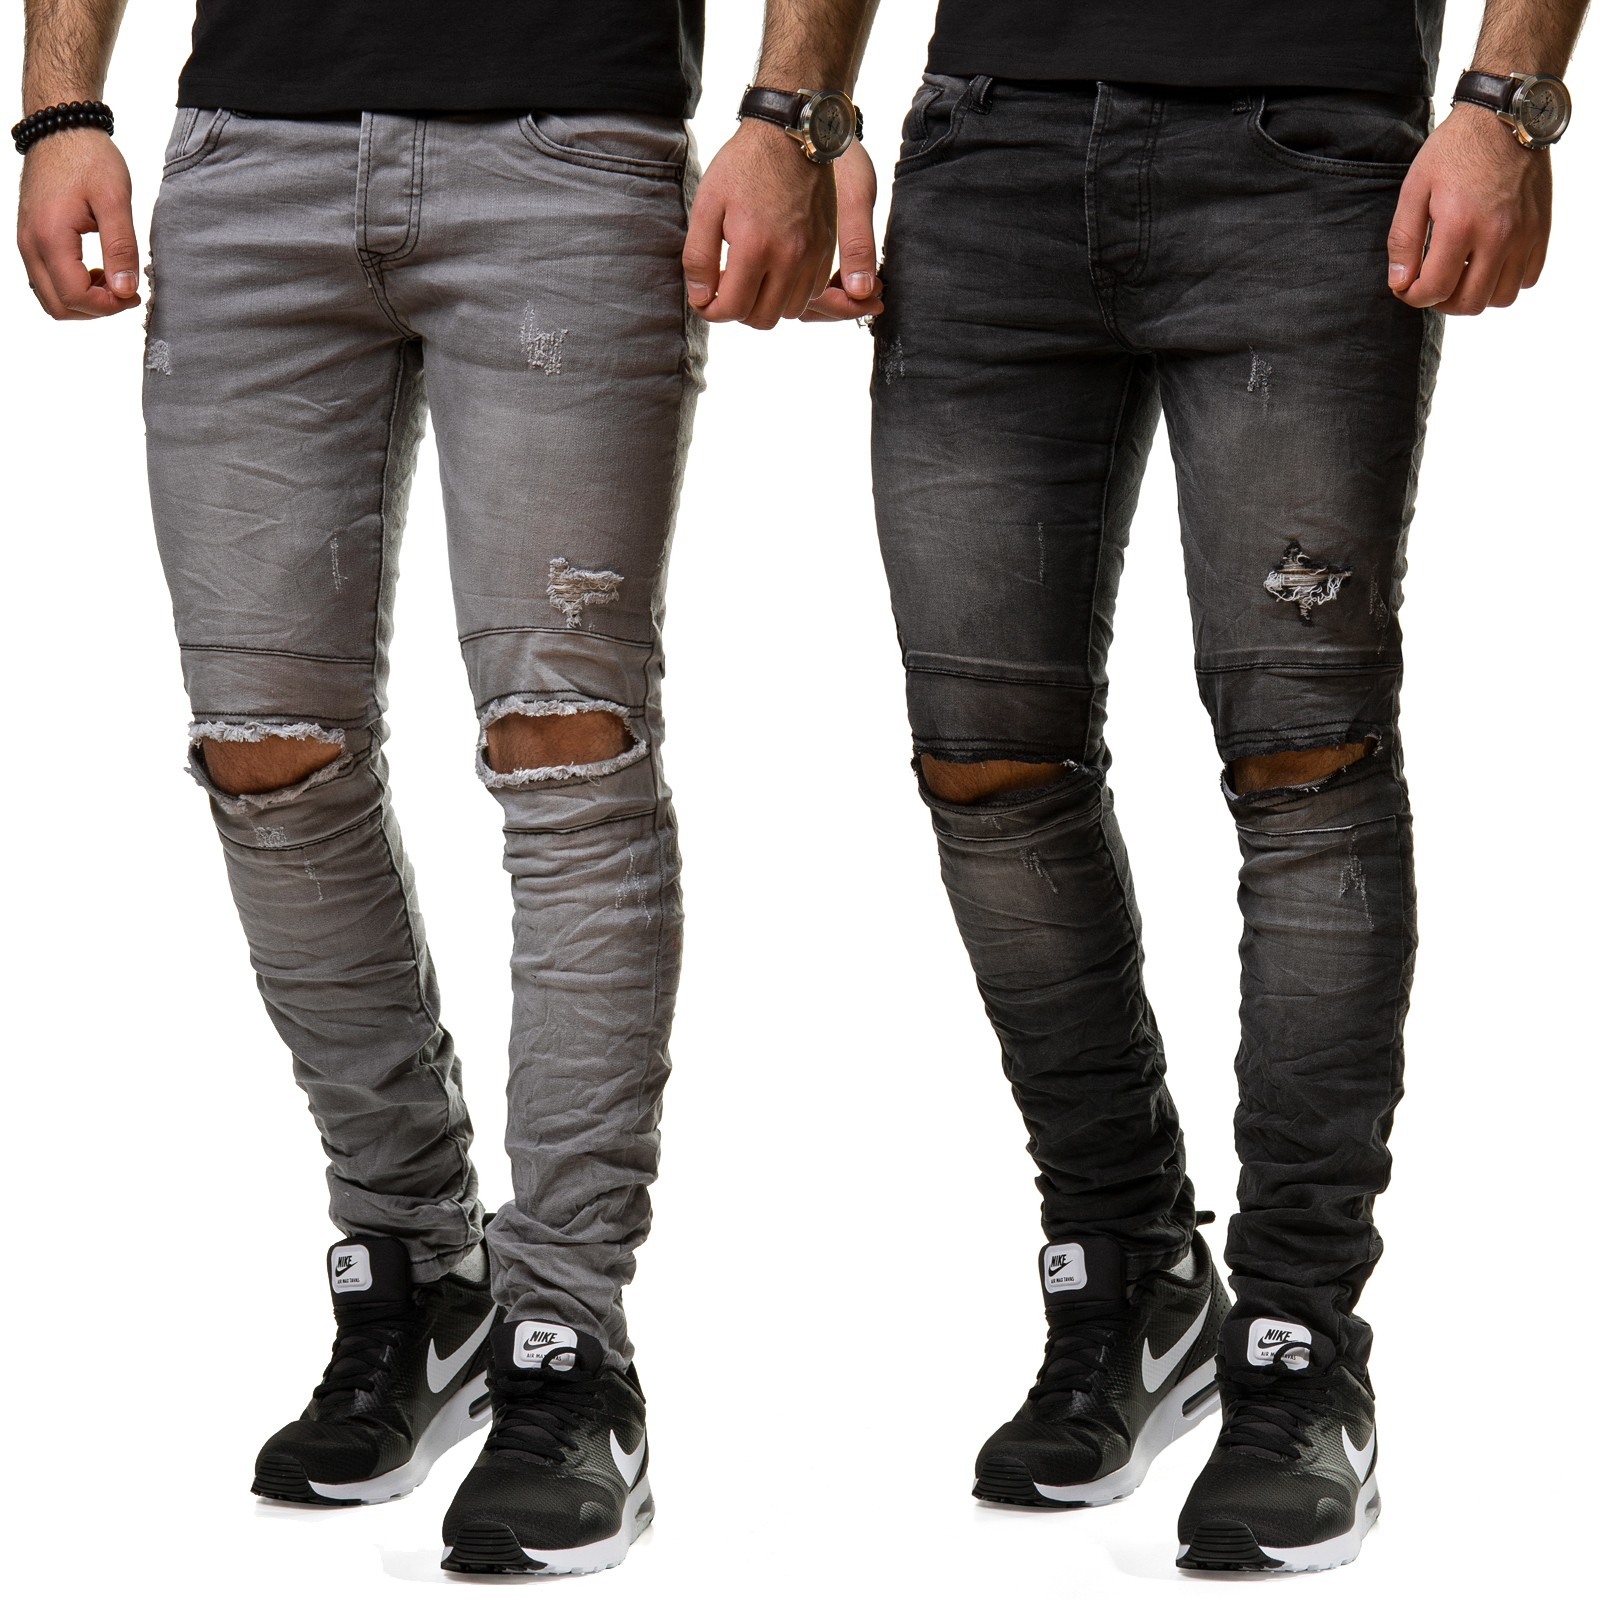 zerrissene jeans herren 1000 ideas about hipster outfits. Black Bedroom Furniture Sets. Home Design Ideas